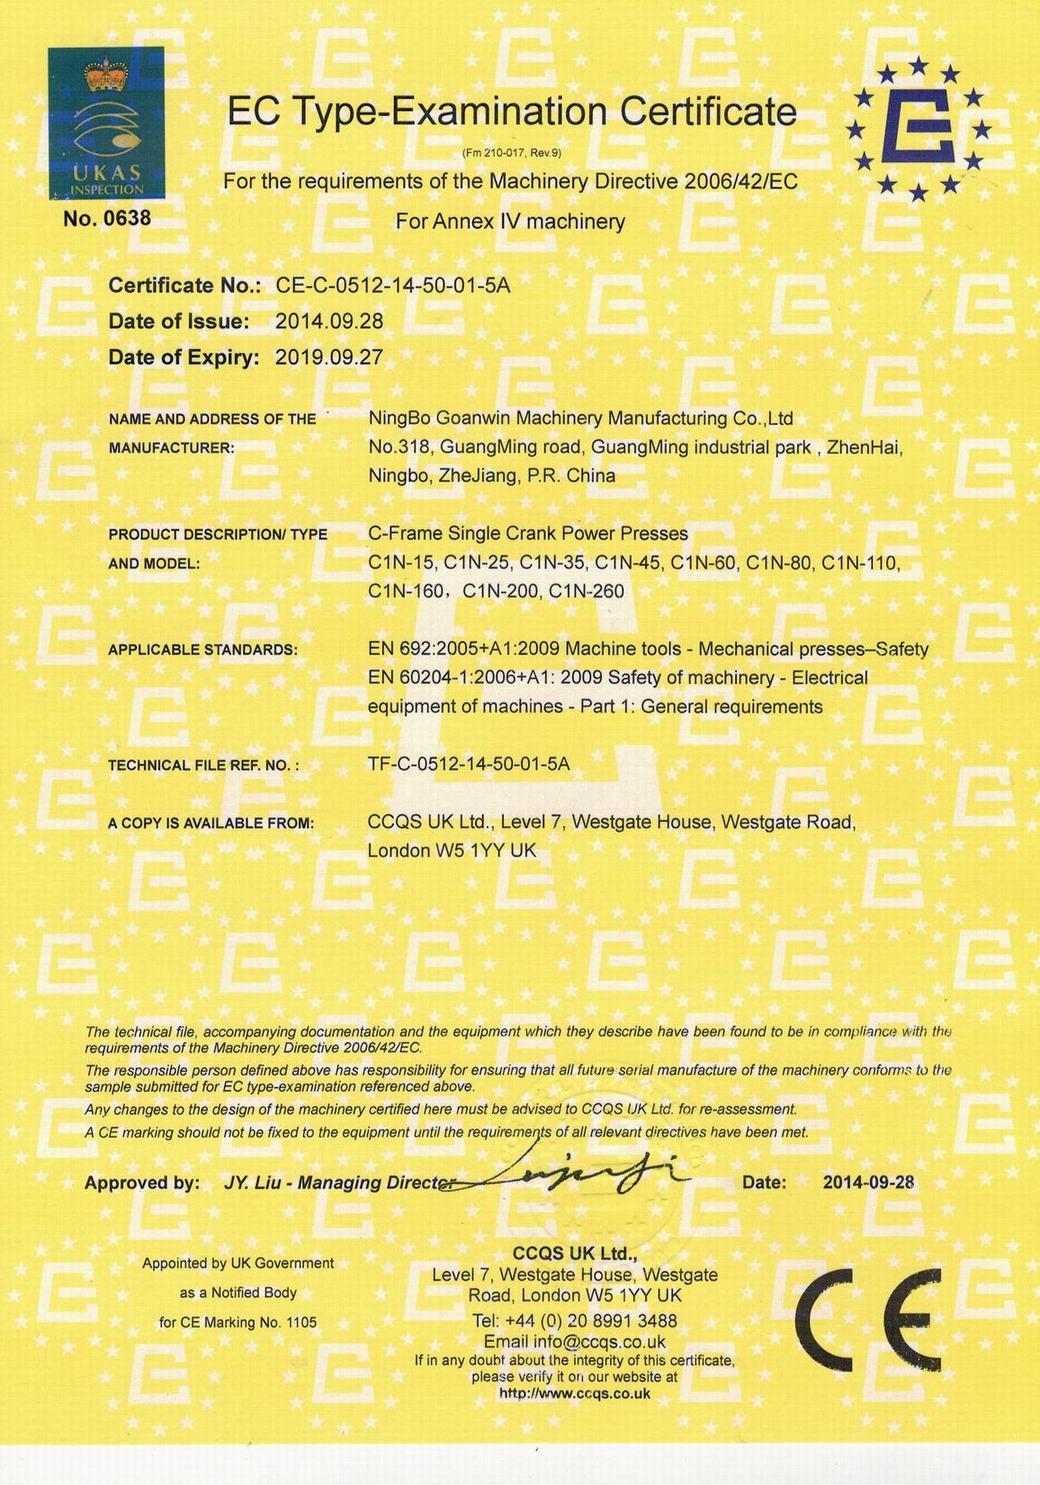 EC Type-Examination Certificate